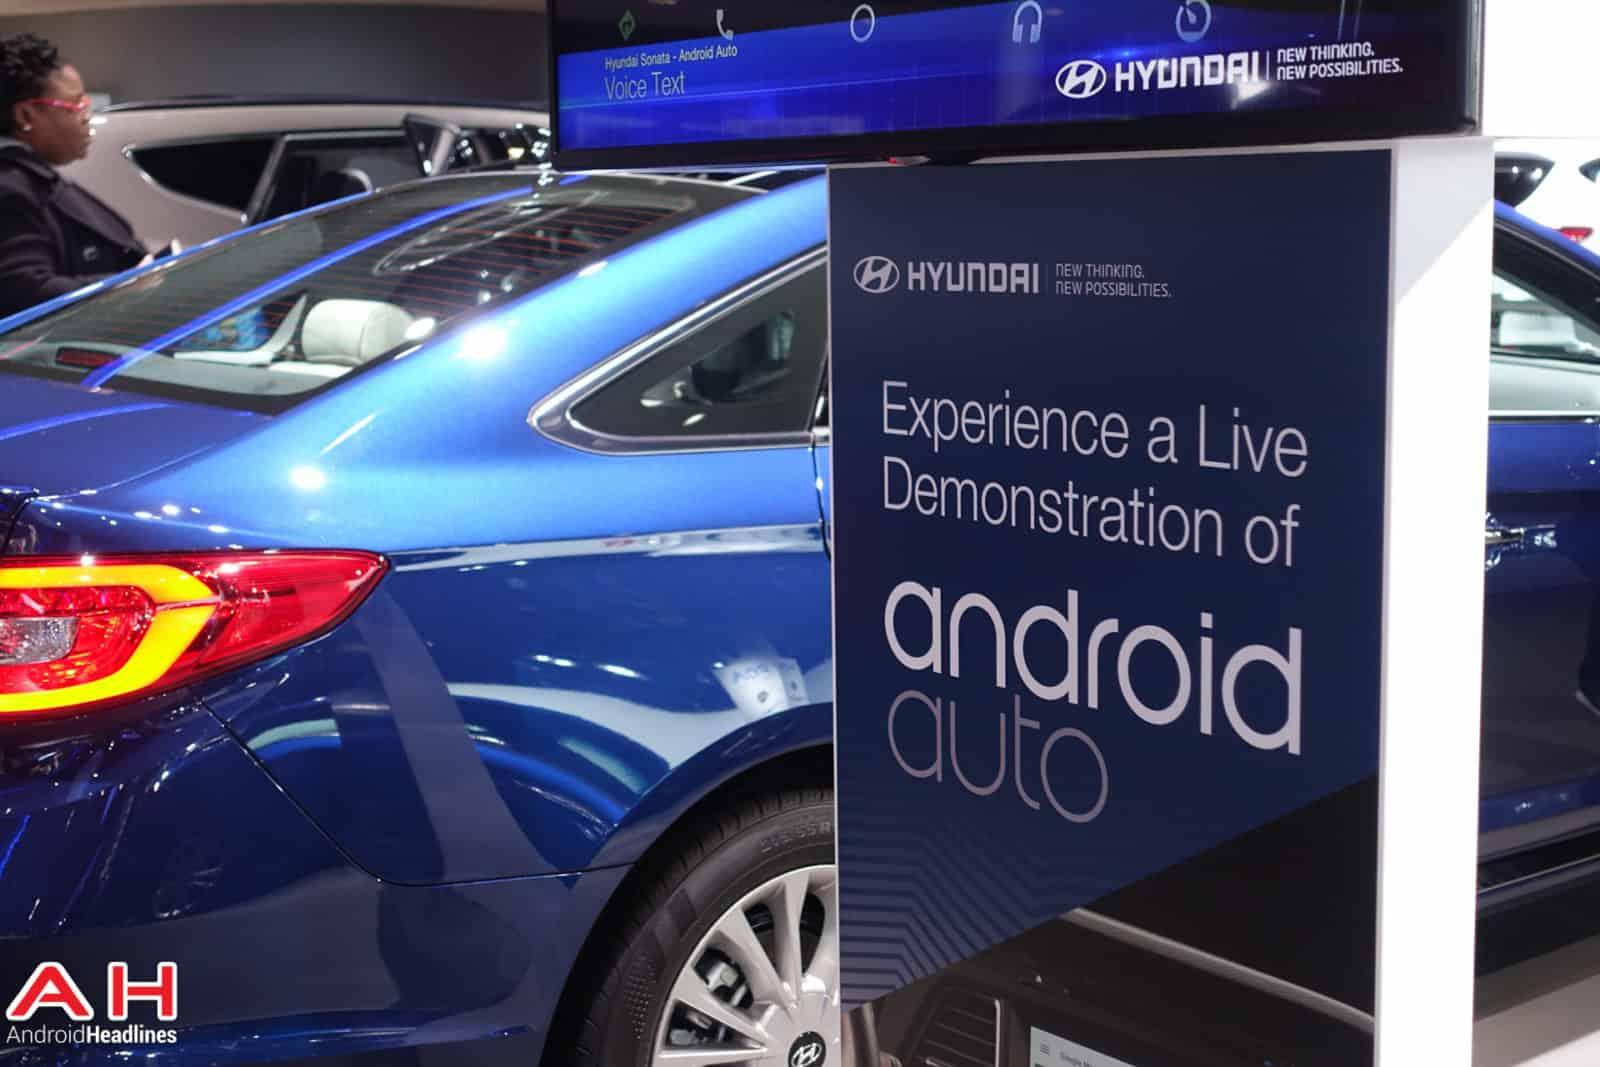 Hyundai-Android-Auto-AH-02500